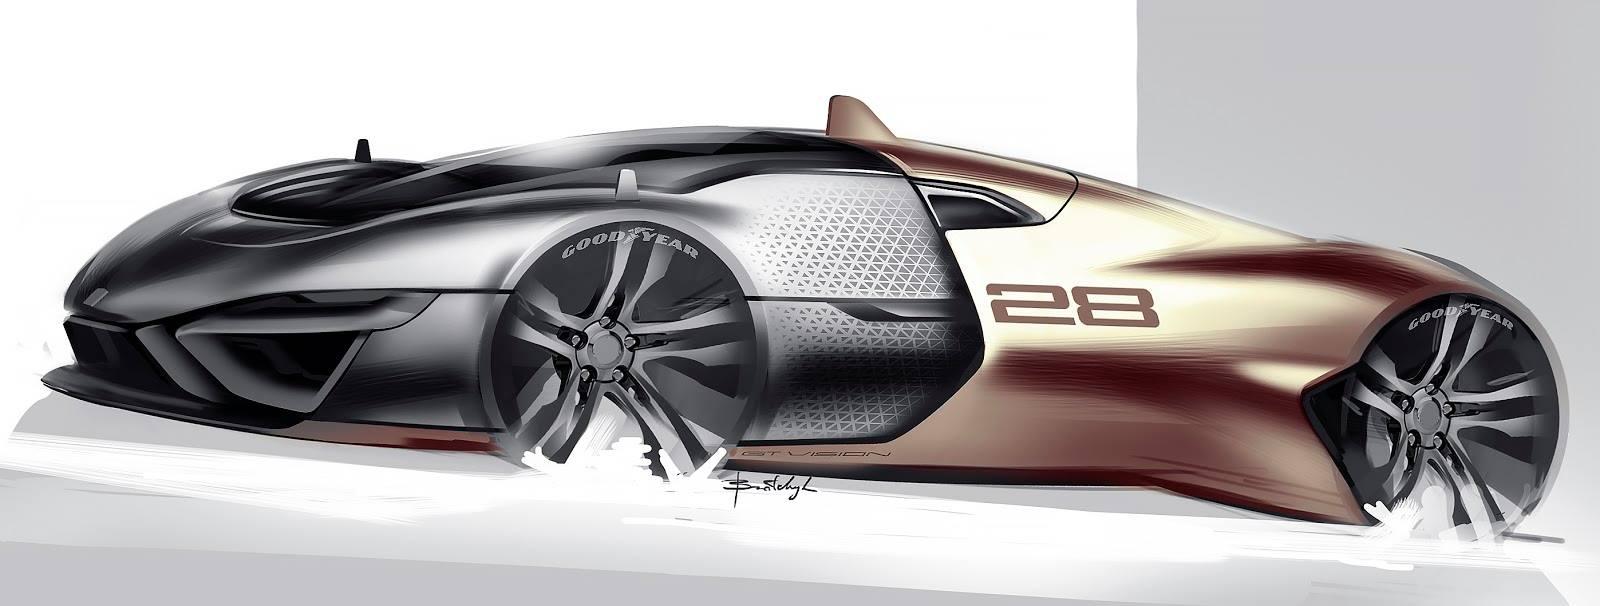 23405813 1711739555533772 2530819766555583793 O Png 1600 606 Concept Cars Concept Car Design Futuristic Cars